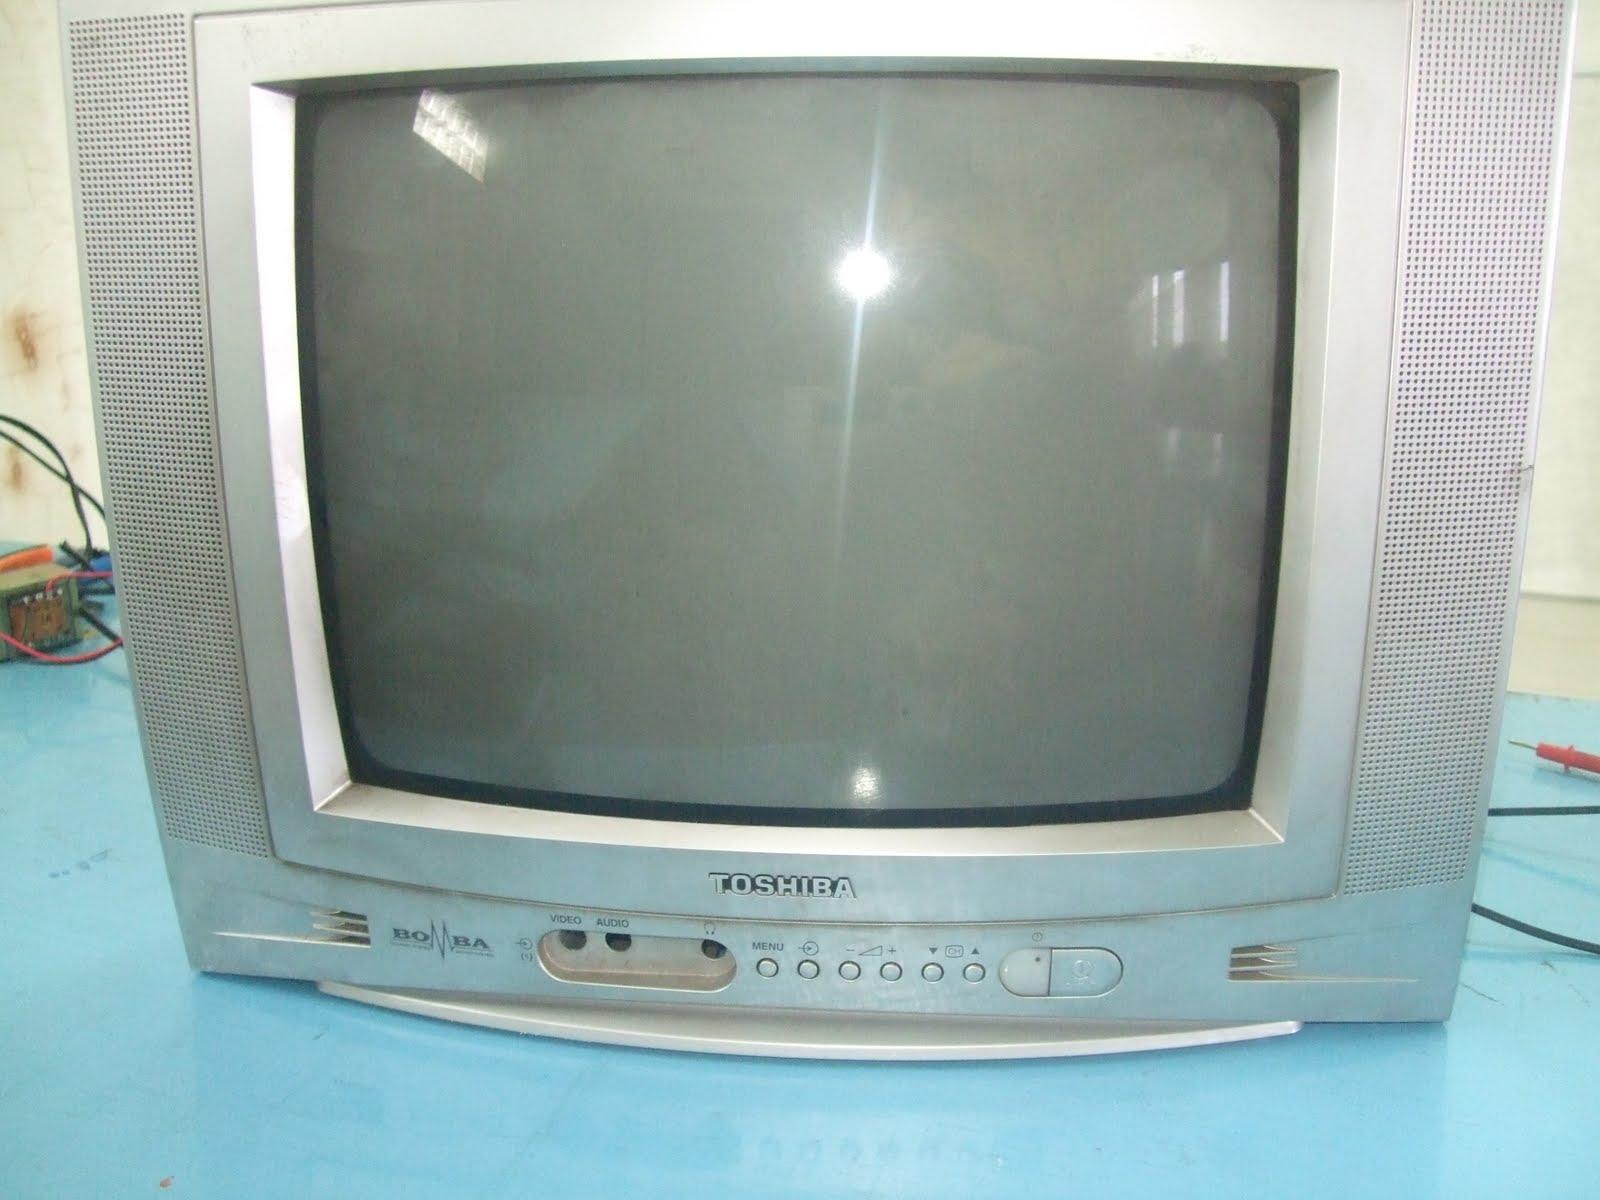 Service tv tabung computerindo diagram blok televisi warna ccuart Images